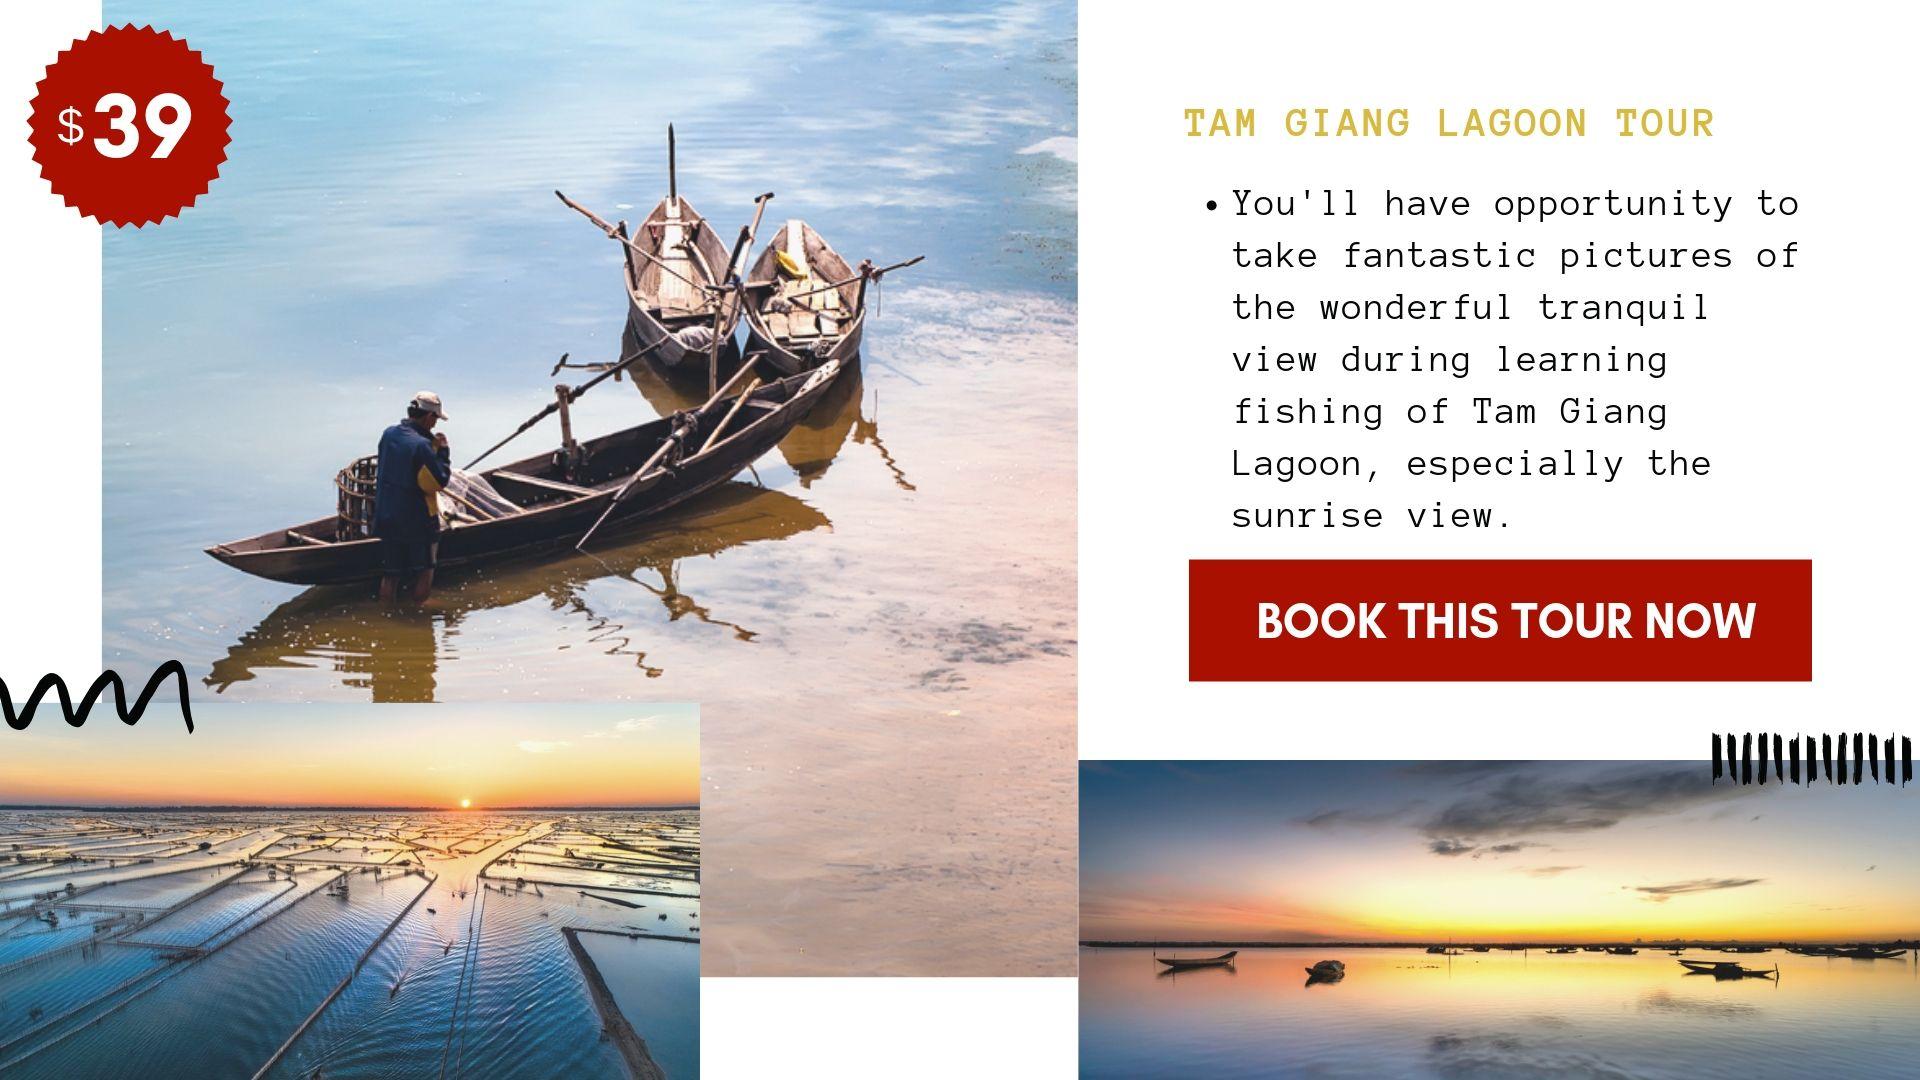 Tam Giang Lagoon Tour